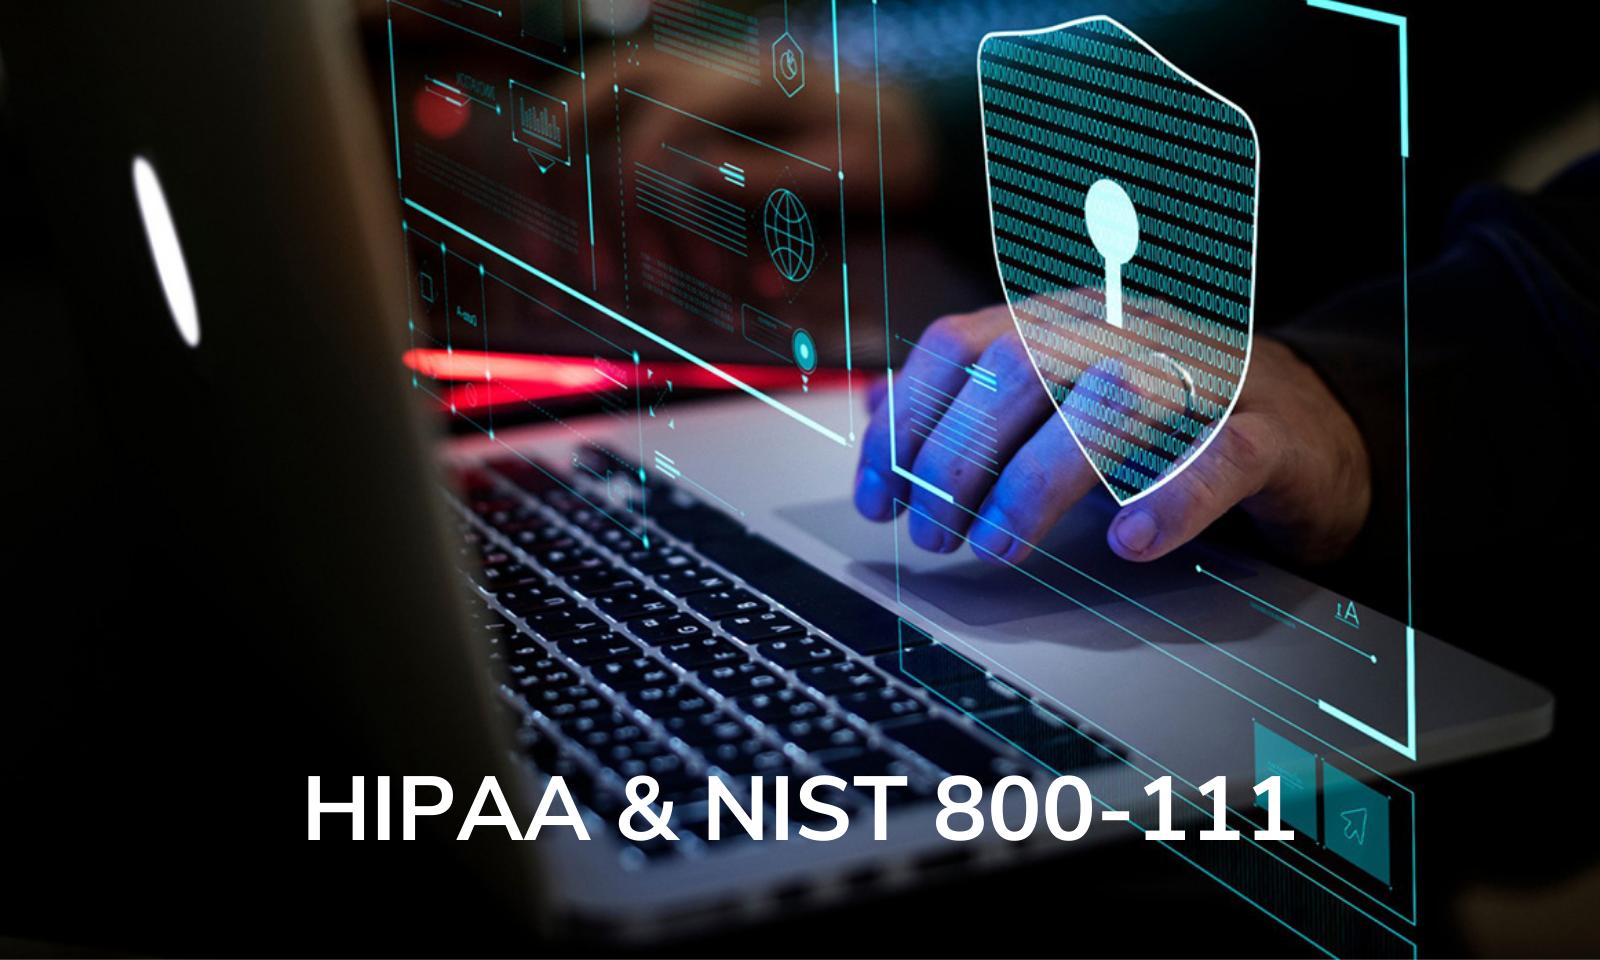 HIPAA & NIST 800-111